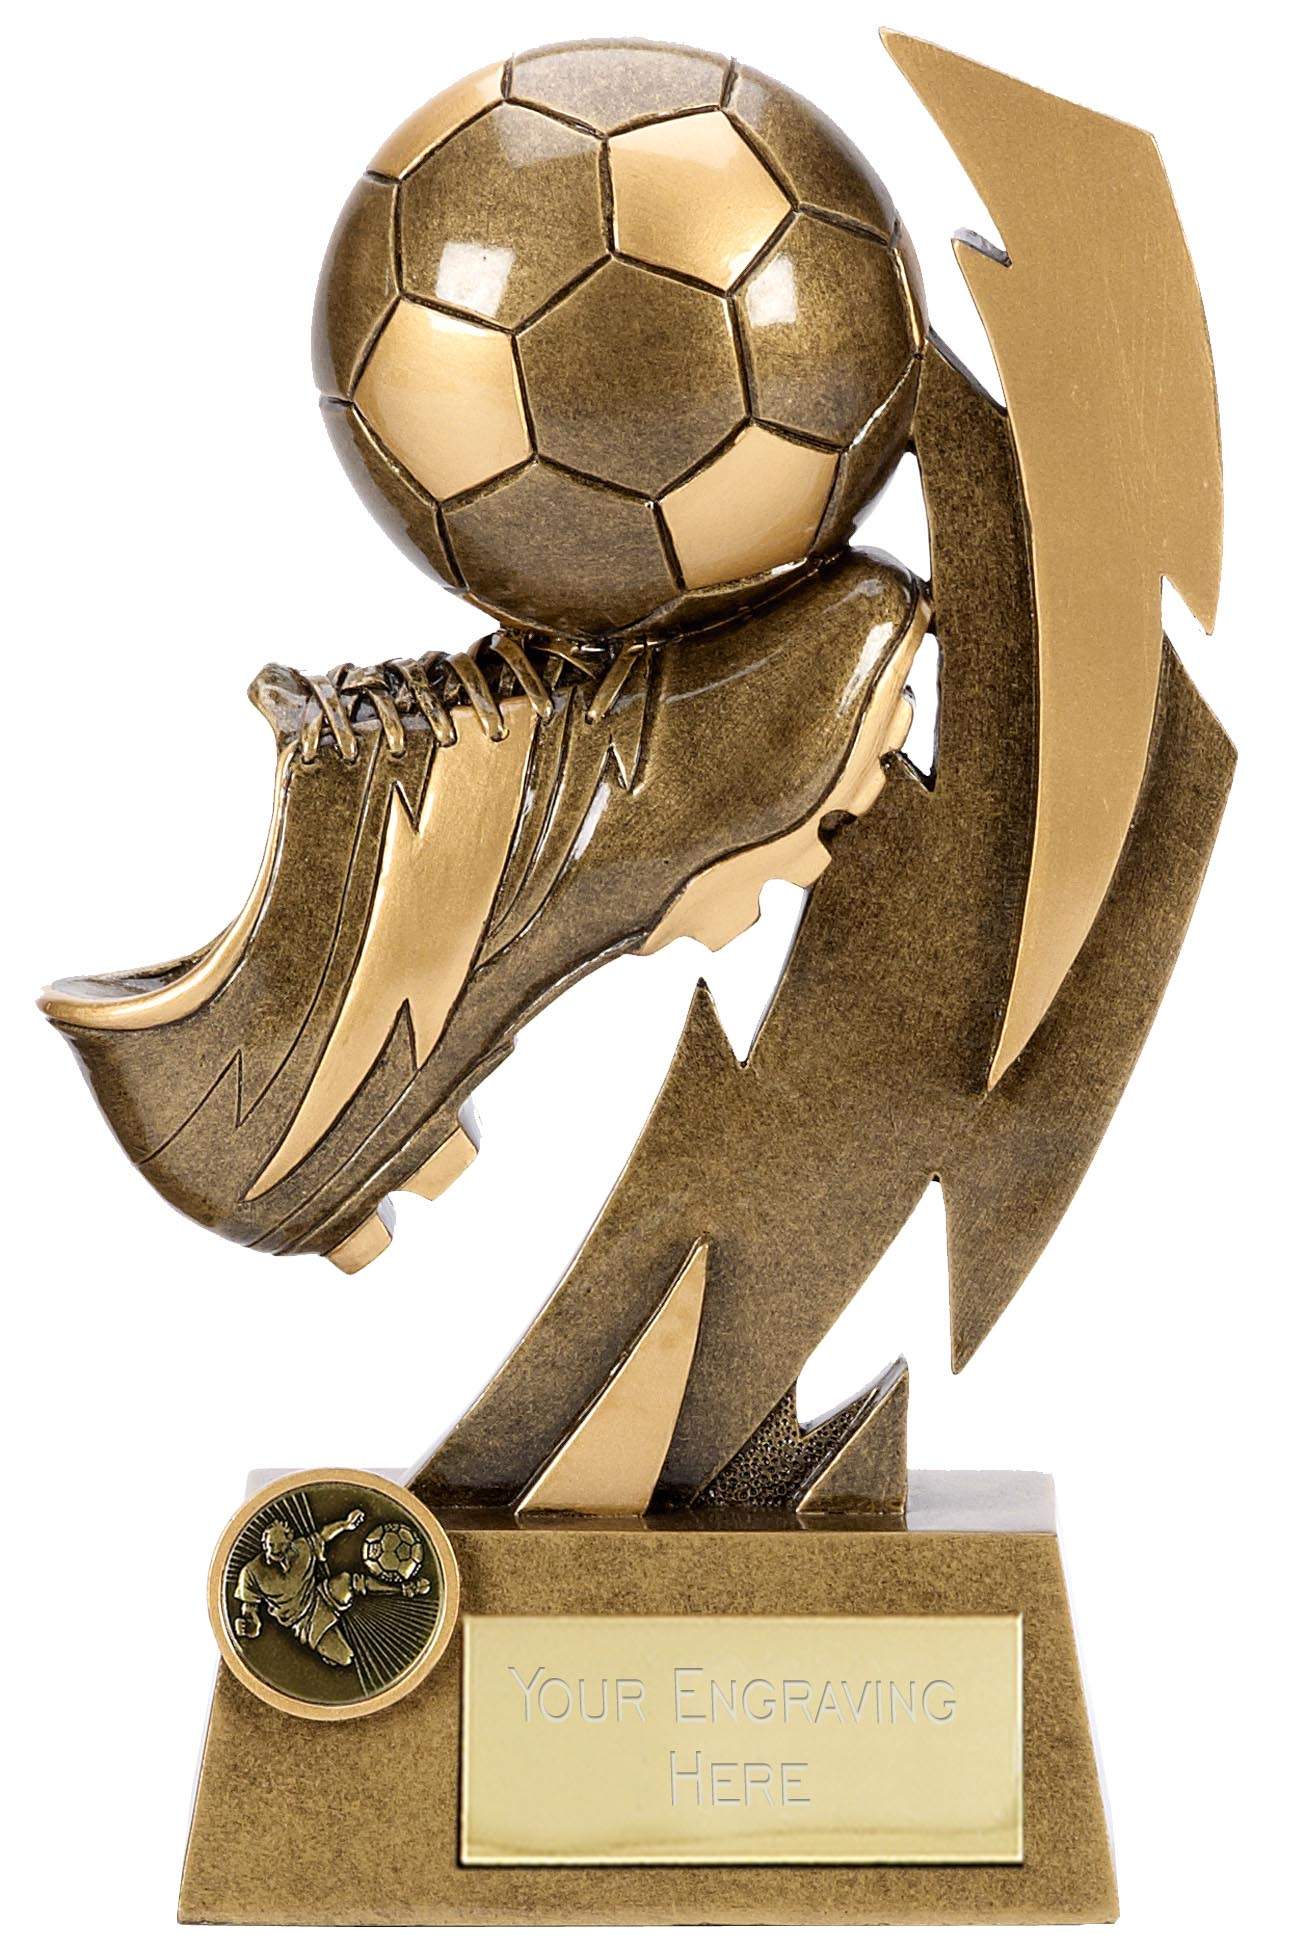 Make Fantasy Football trophy as Award properly